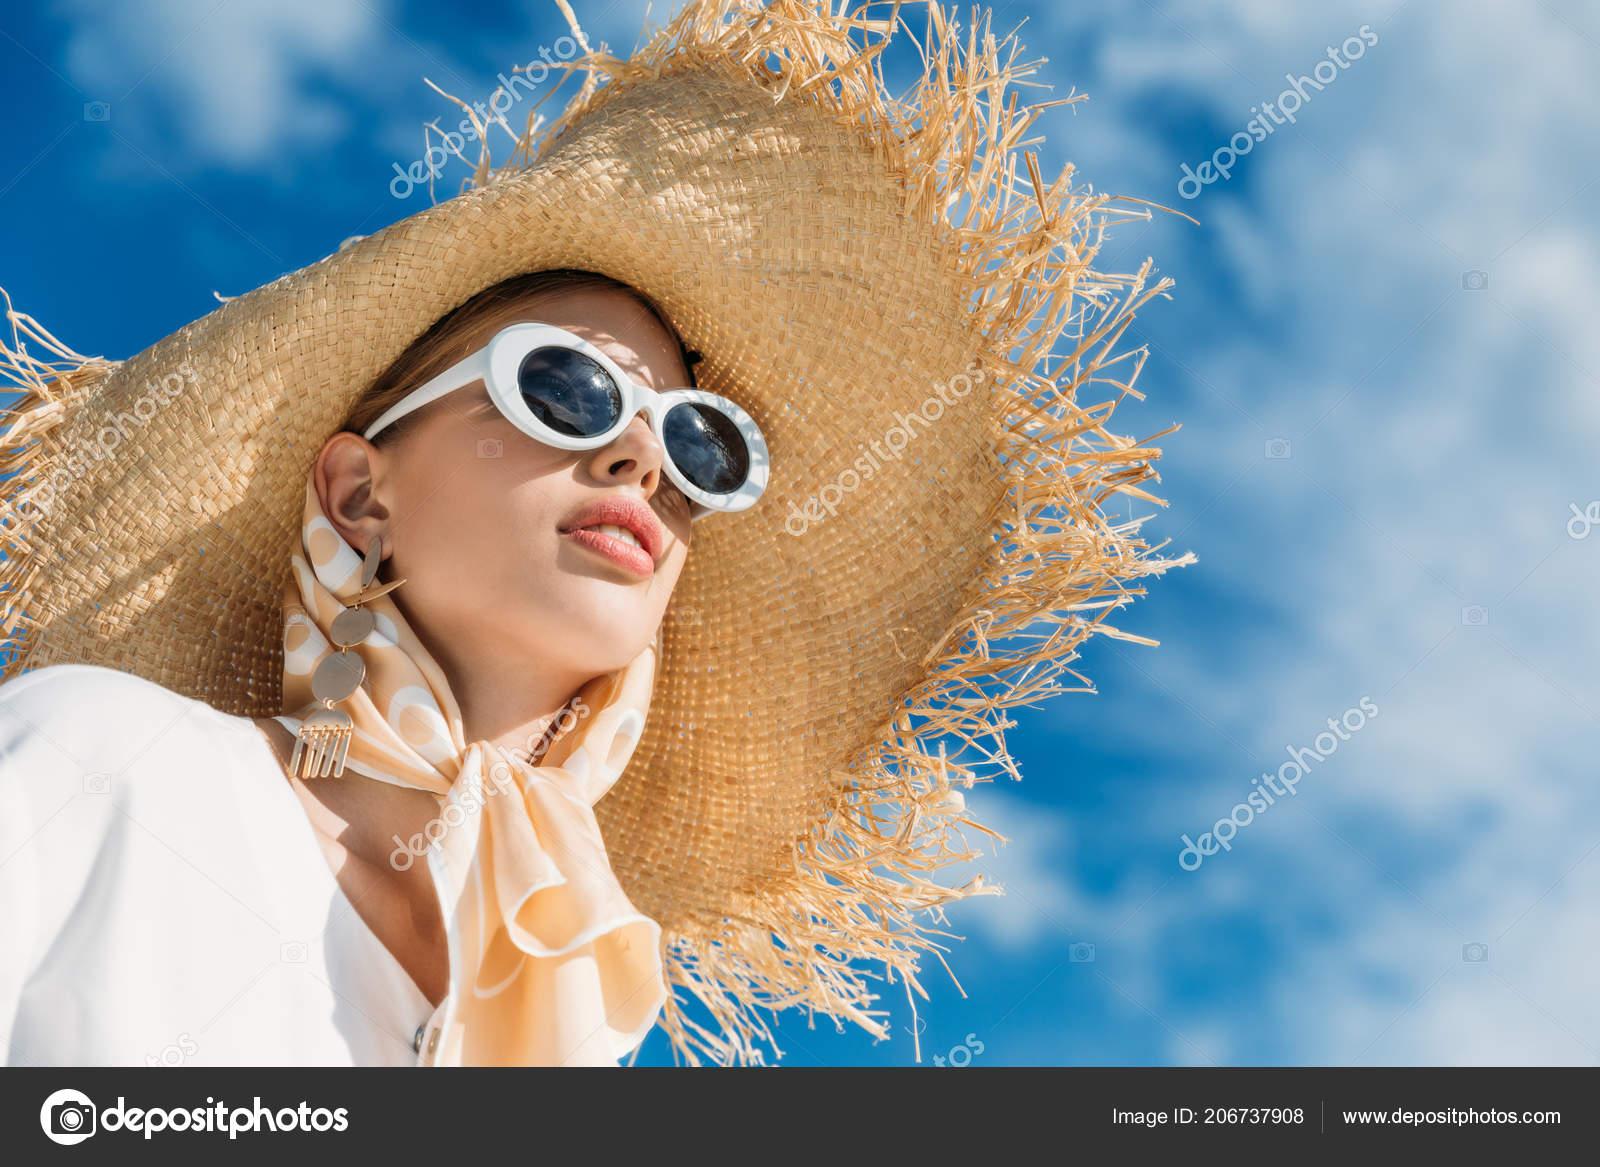 a9ca89592f Όμορφη Κοπέλα Ποζάρει Μοντέρνα Γυαλιά Ηλίου Φουλάρι Και Ψάθινο Καπέλο —  Φωτογραφία Αρχείου